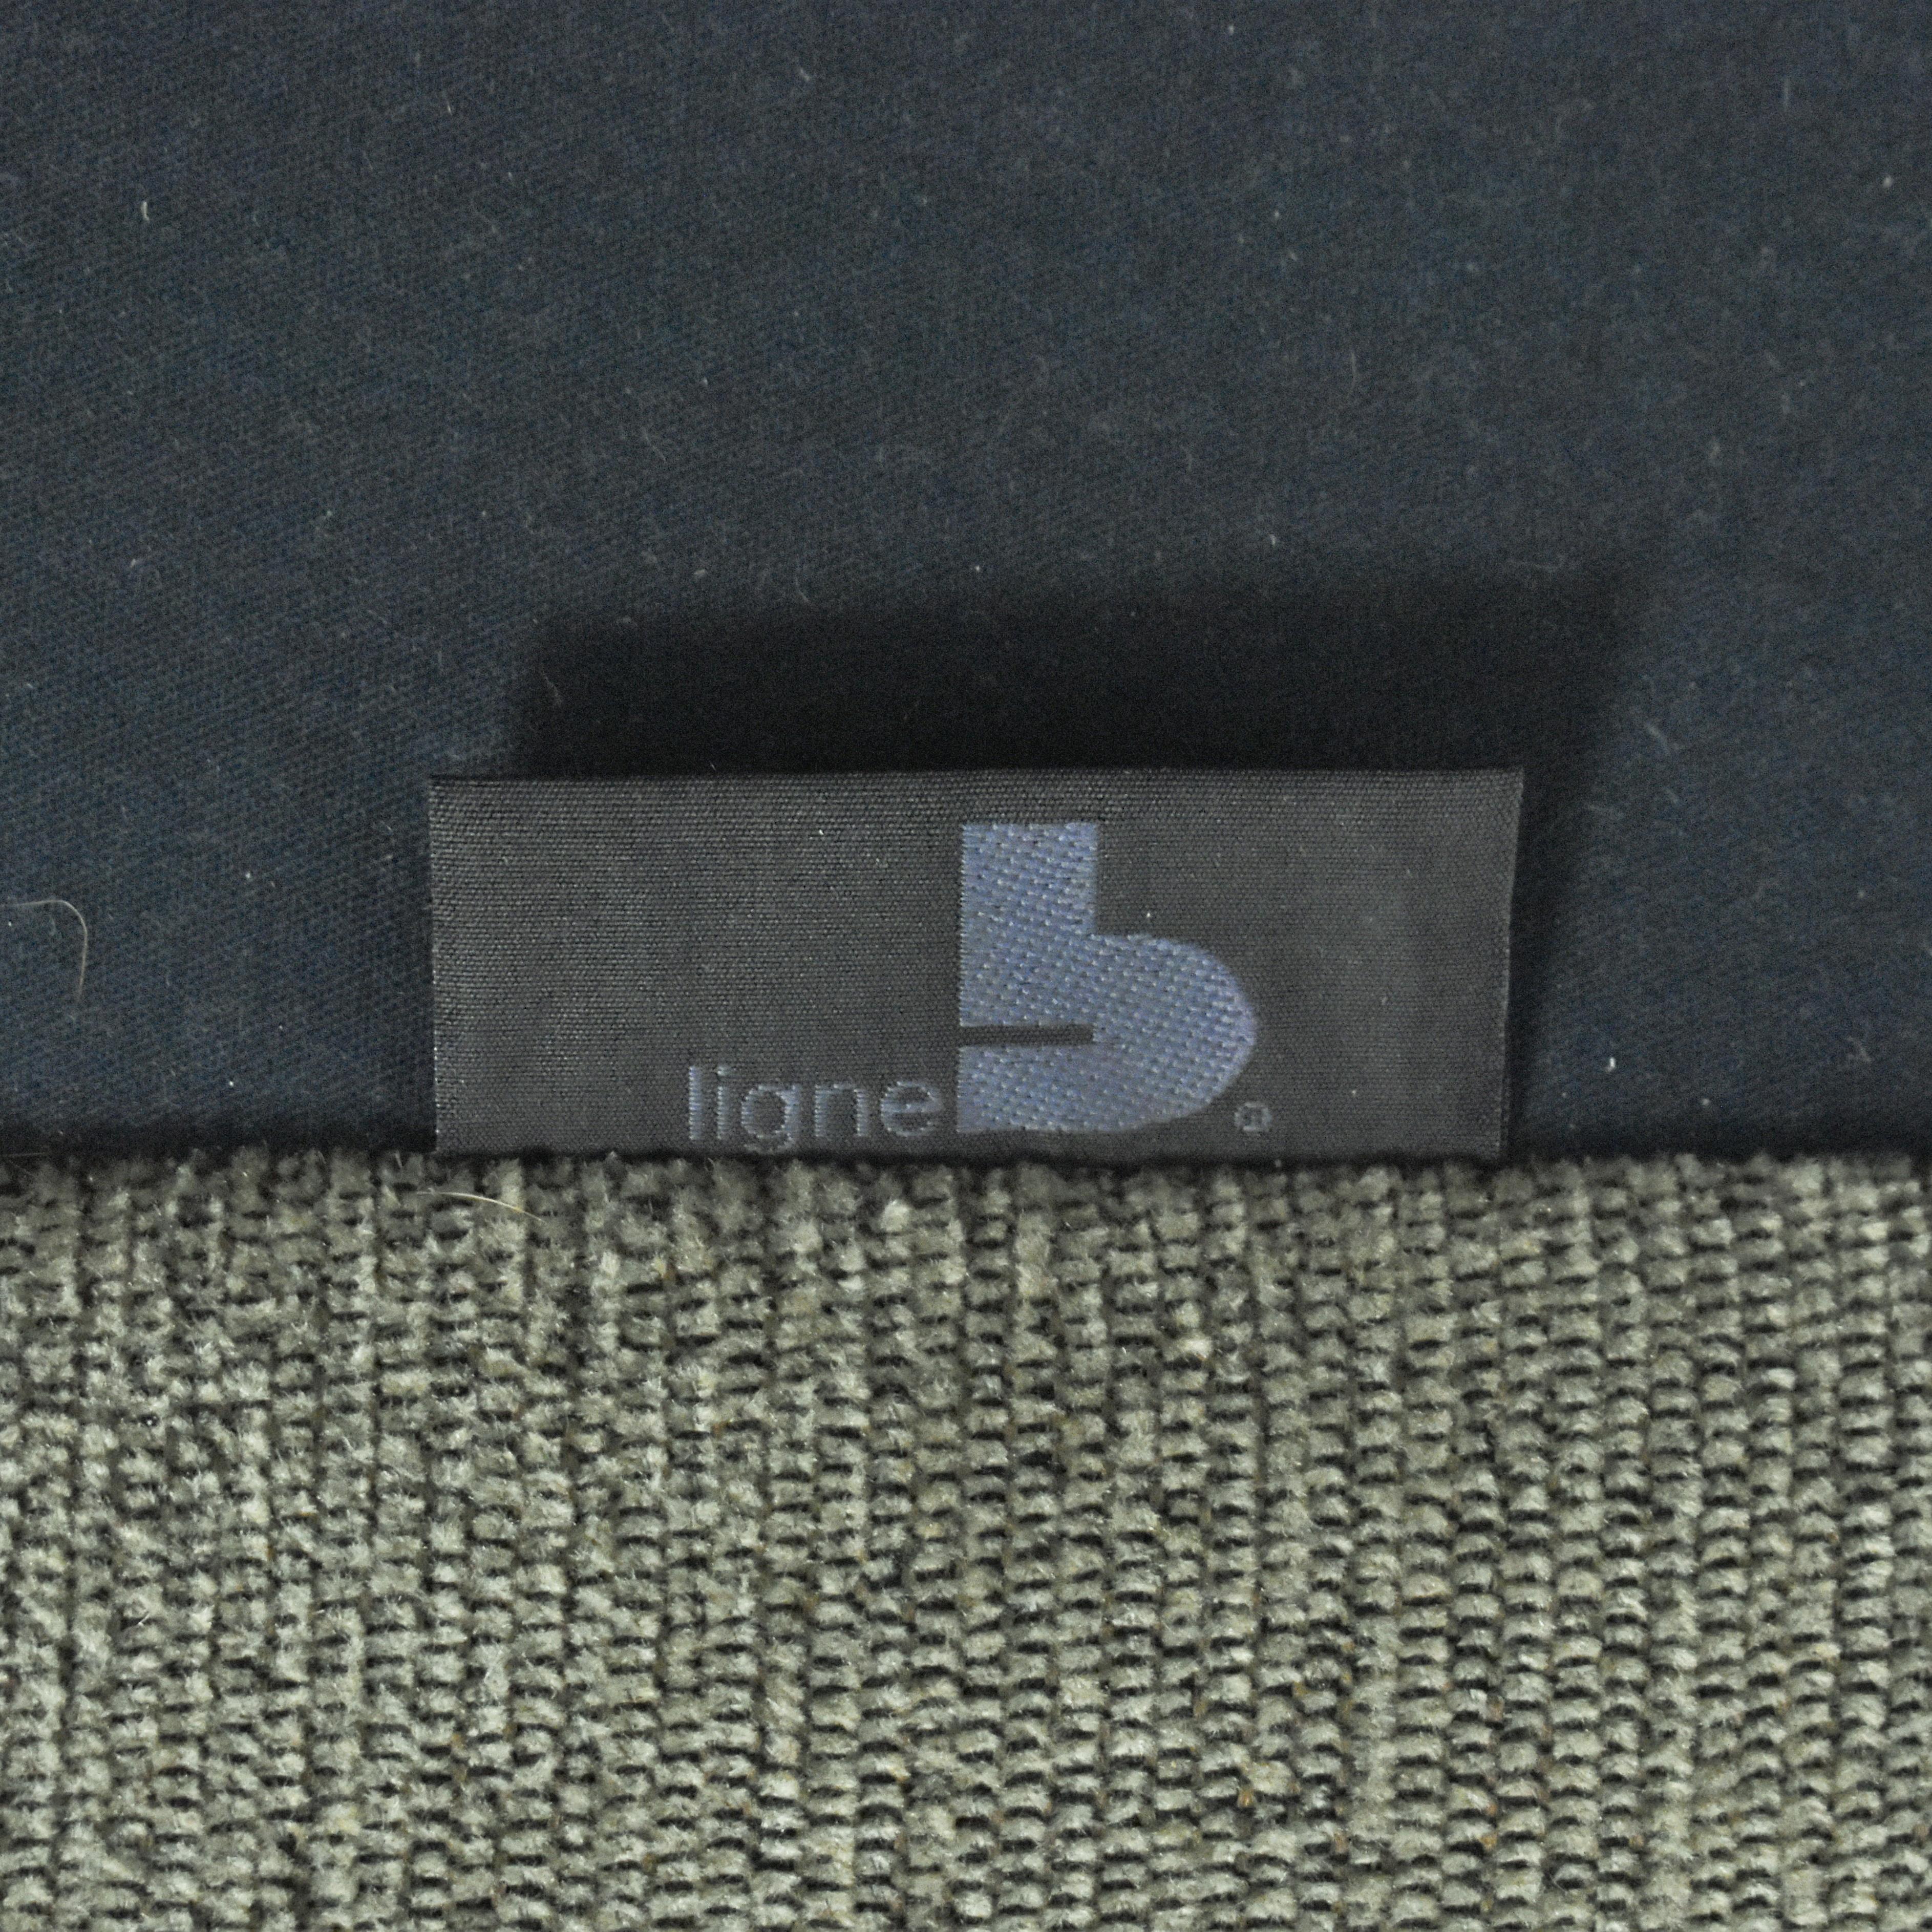 Bloomingdale's Bloomingdale's Left Arm Sofa coupon